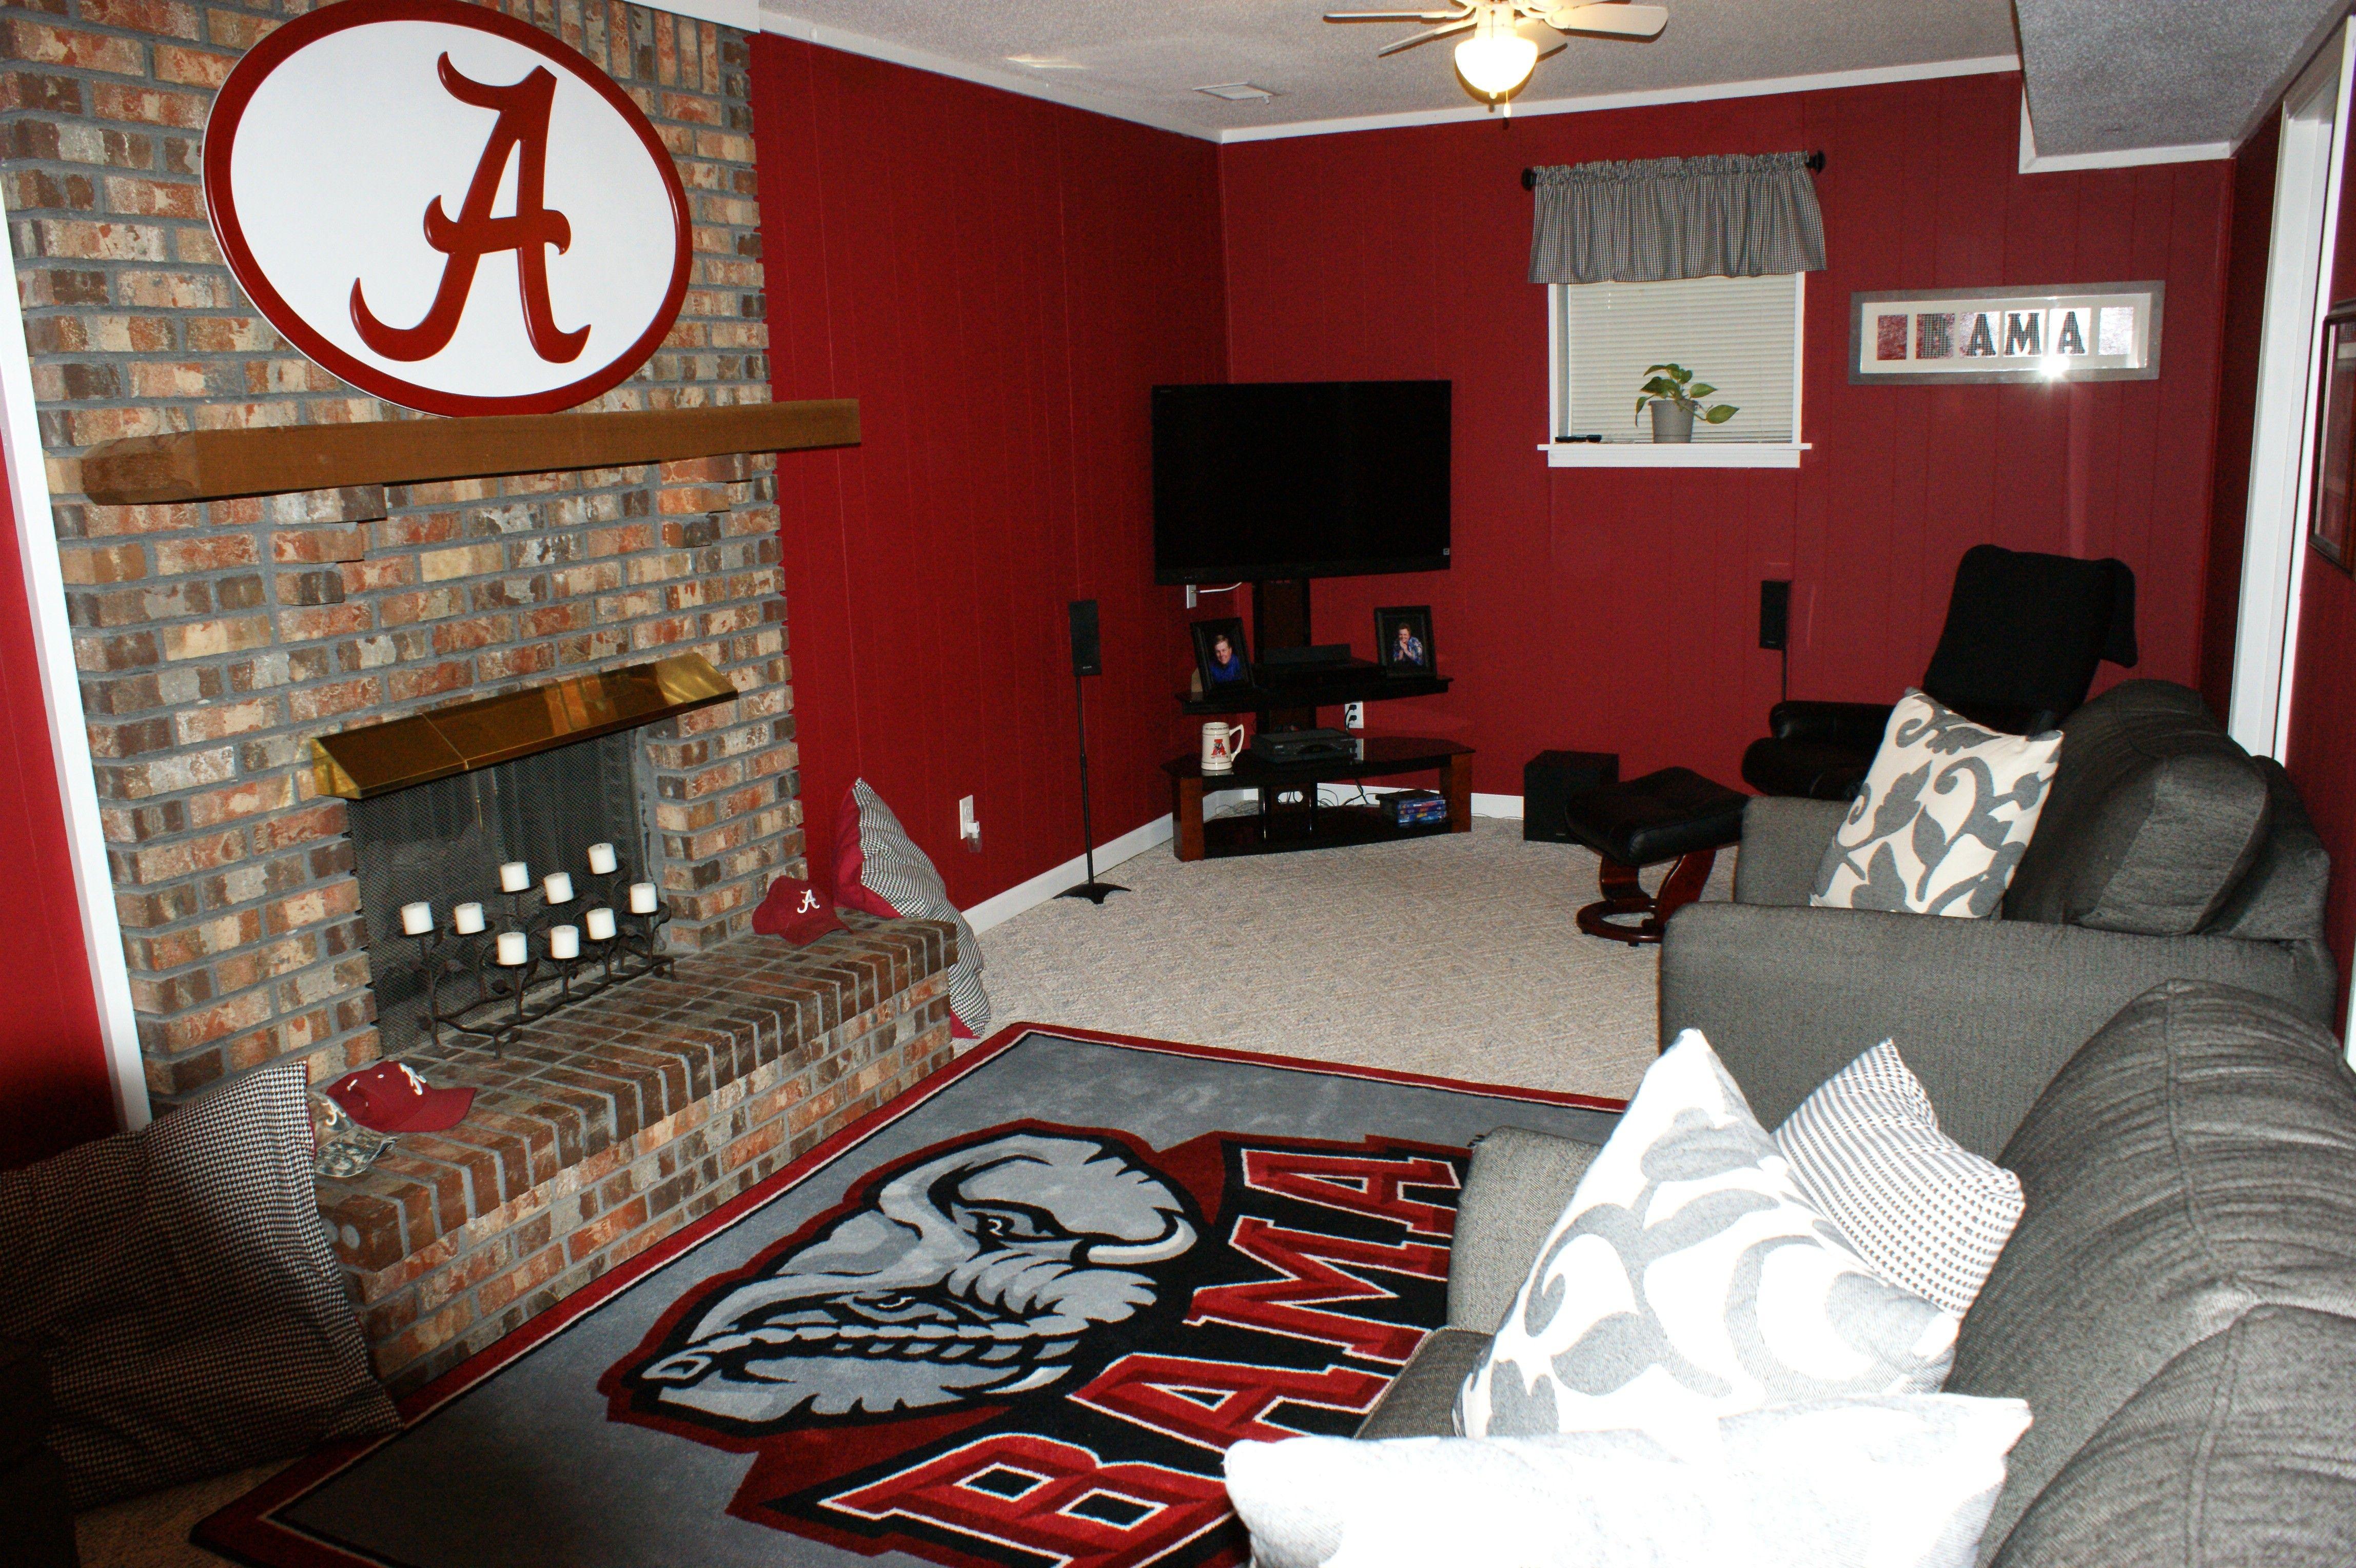 Alabama Man Cave Signs : Love it bama football pinterest